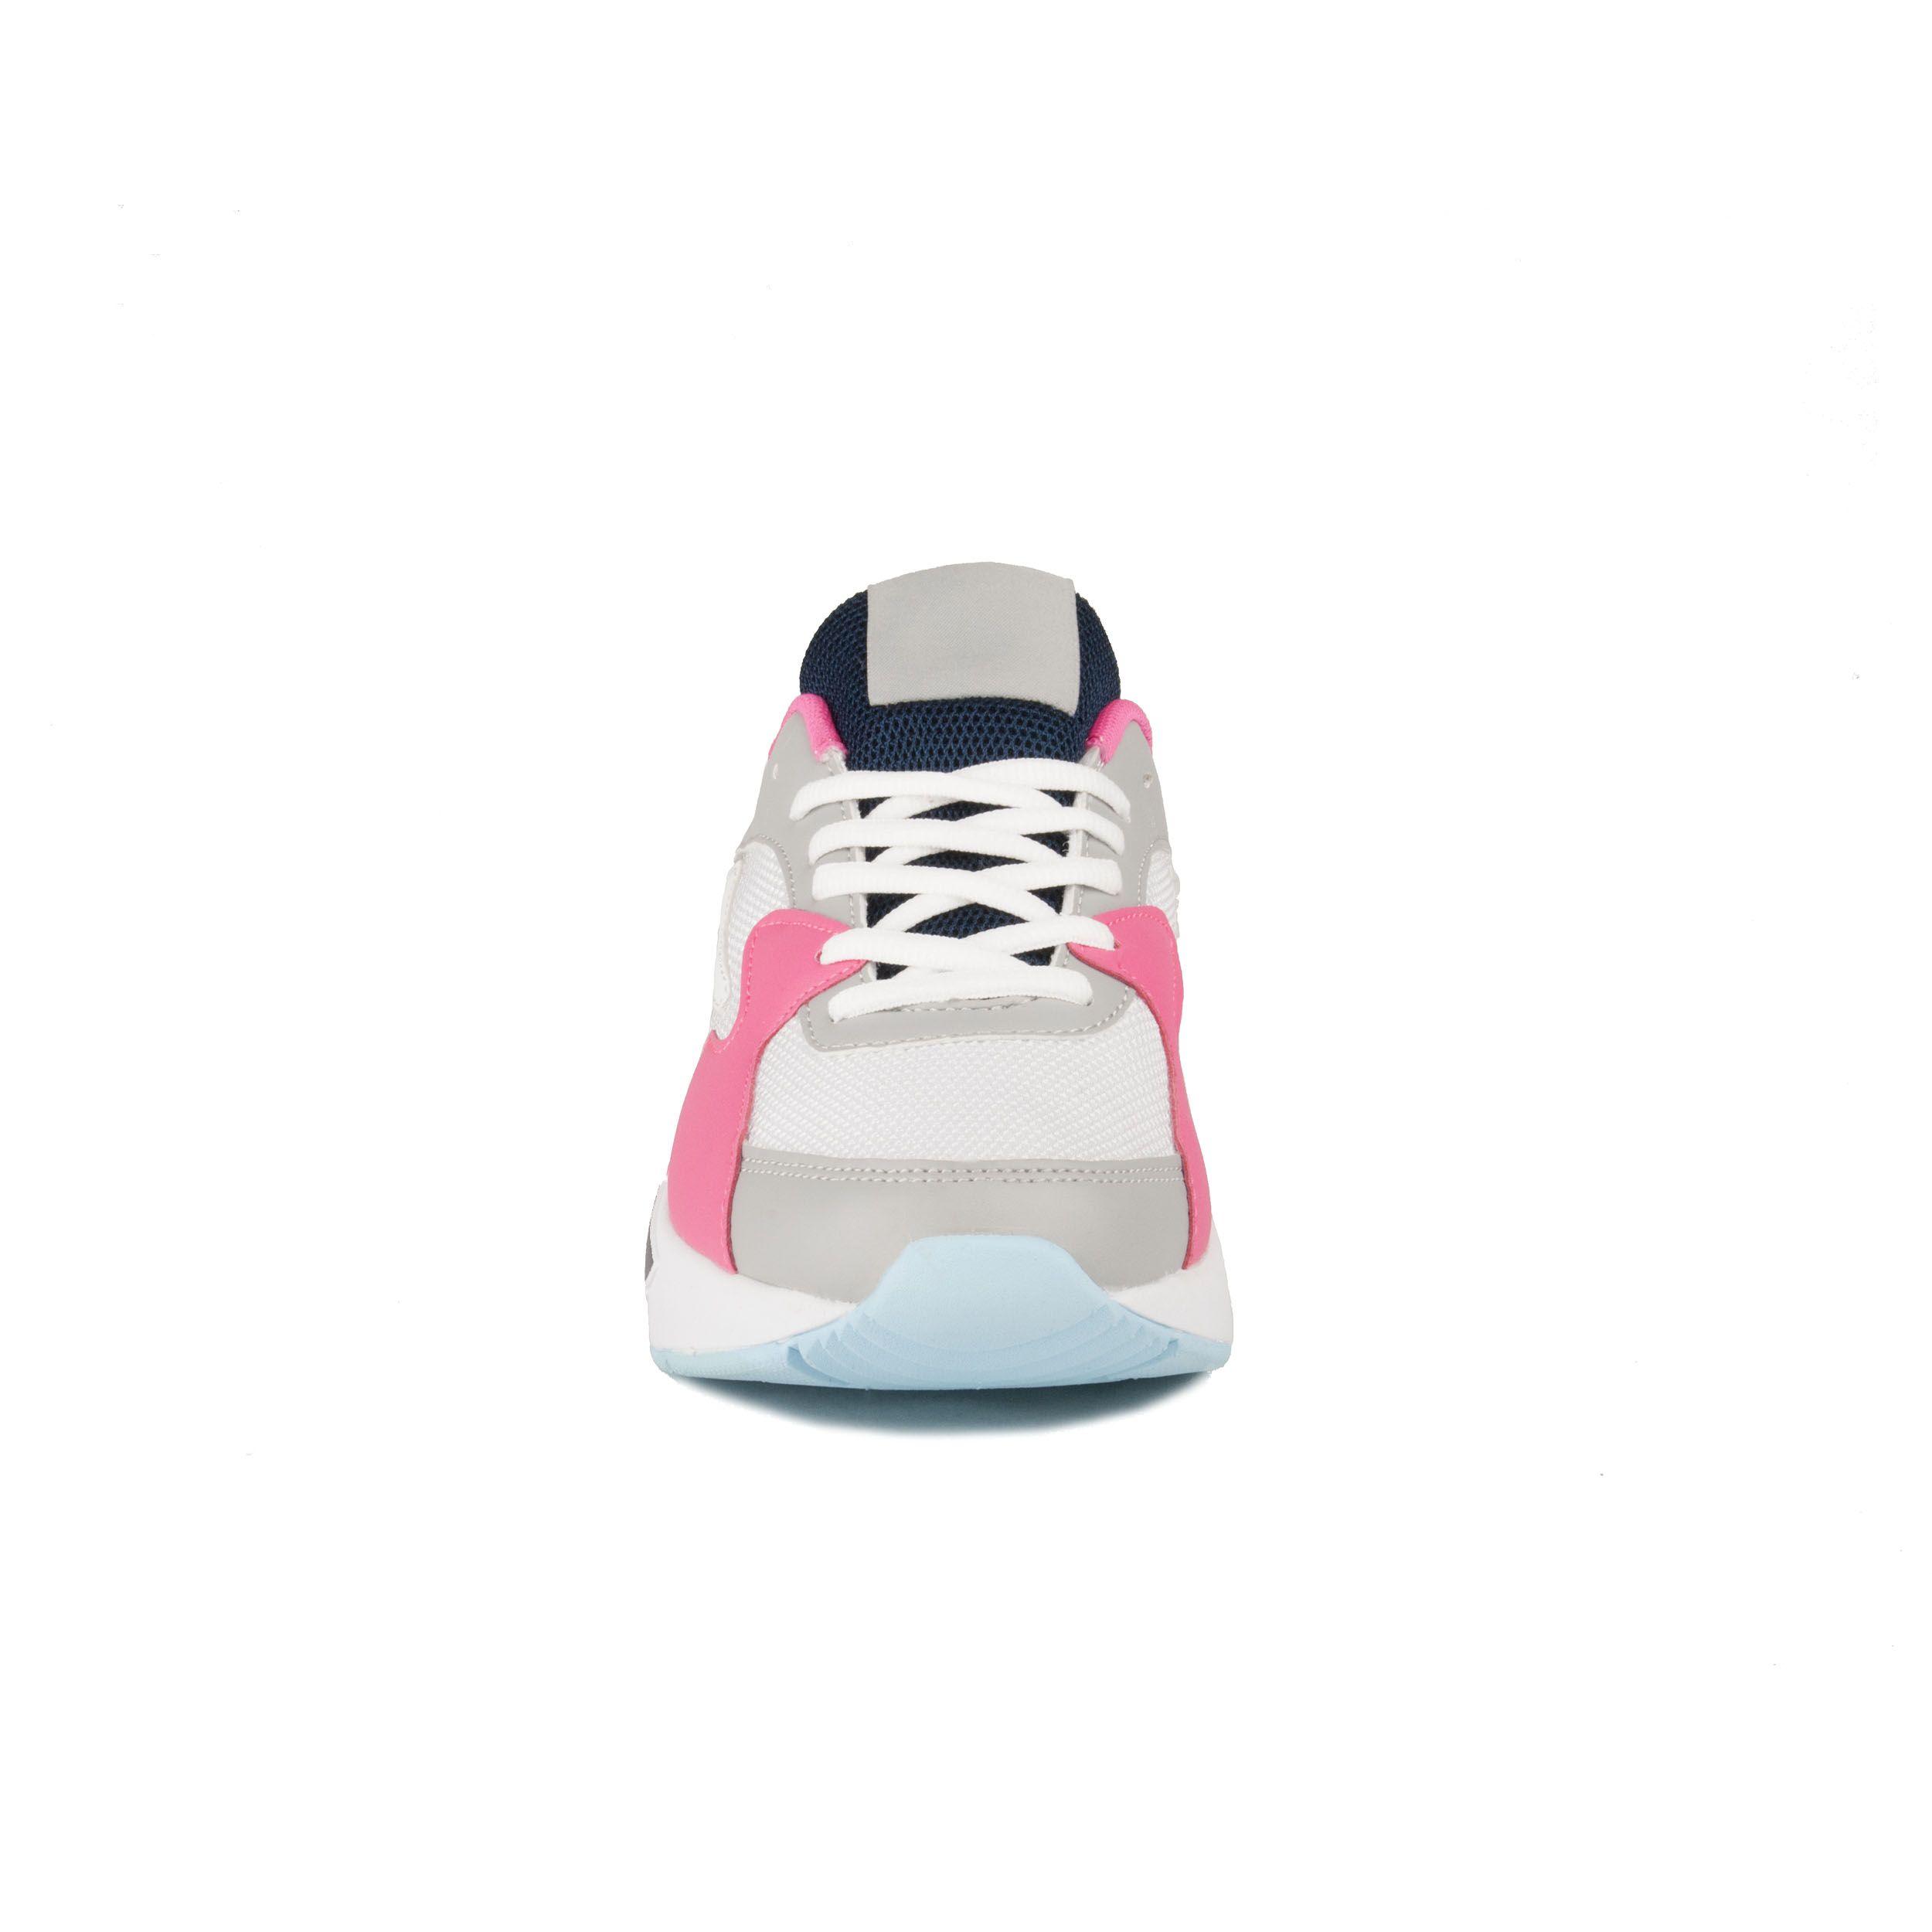 Montevita Comfortable Sneaker in Fuchsia